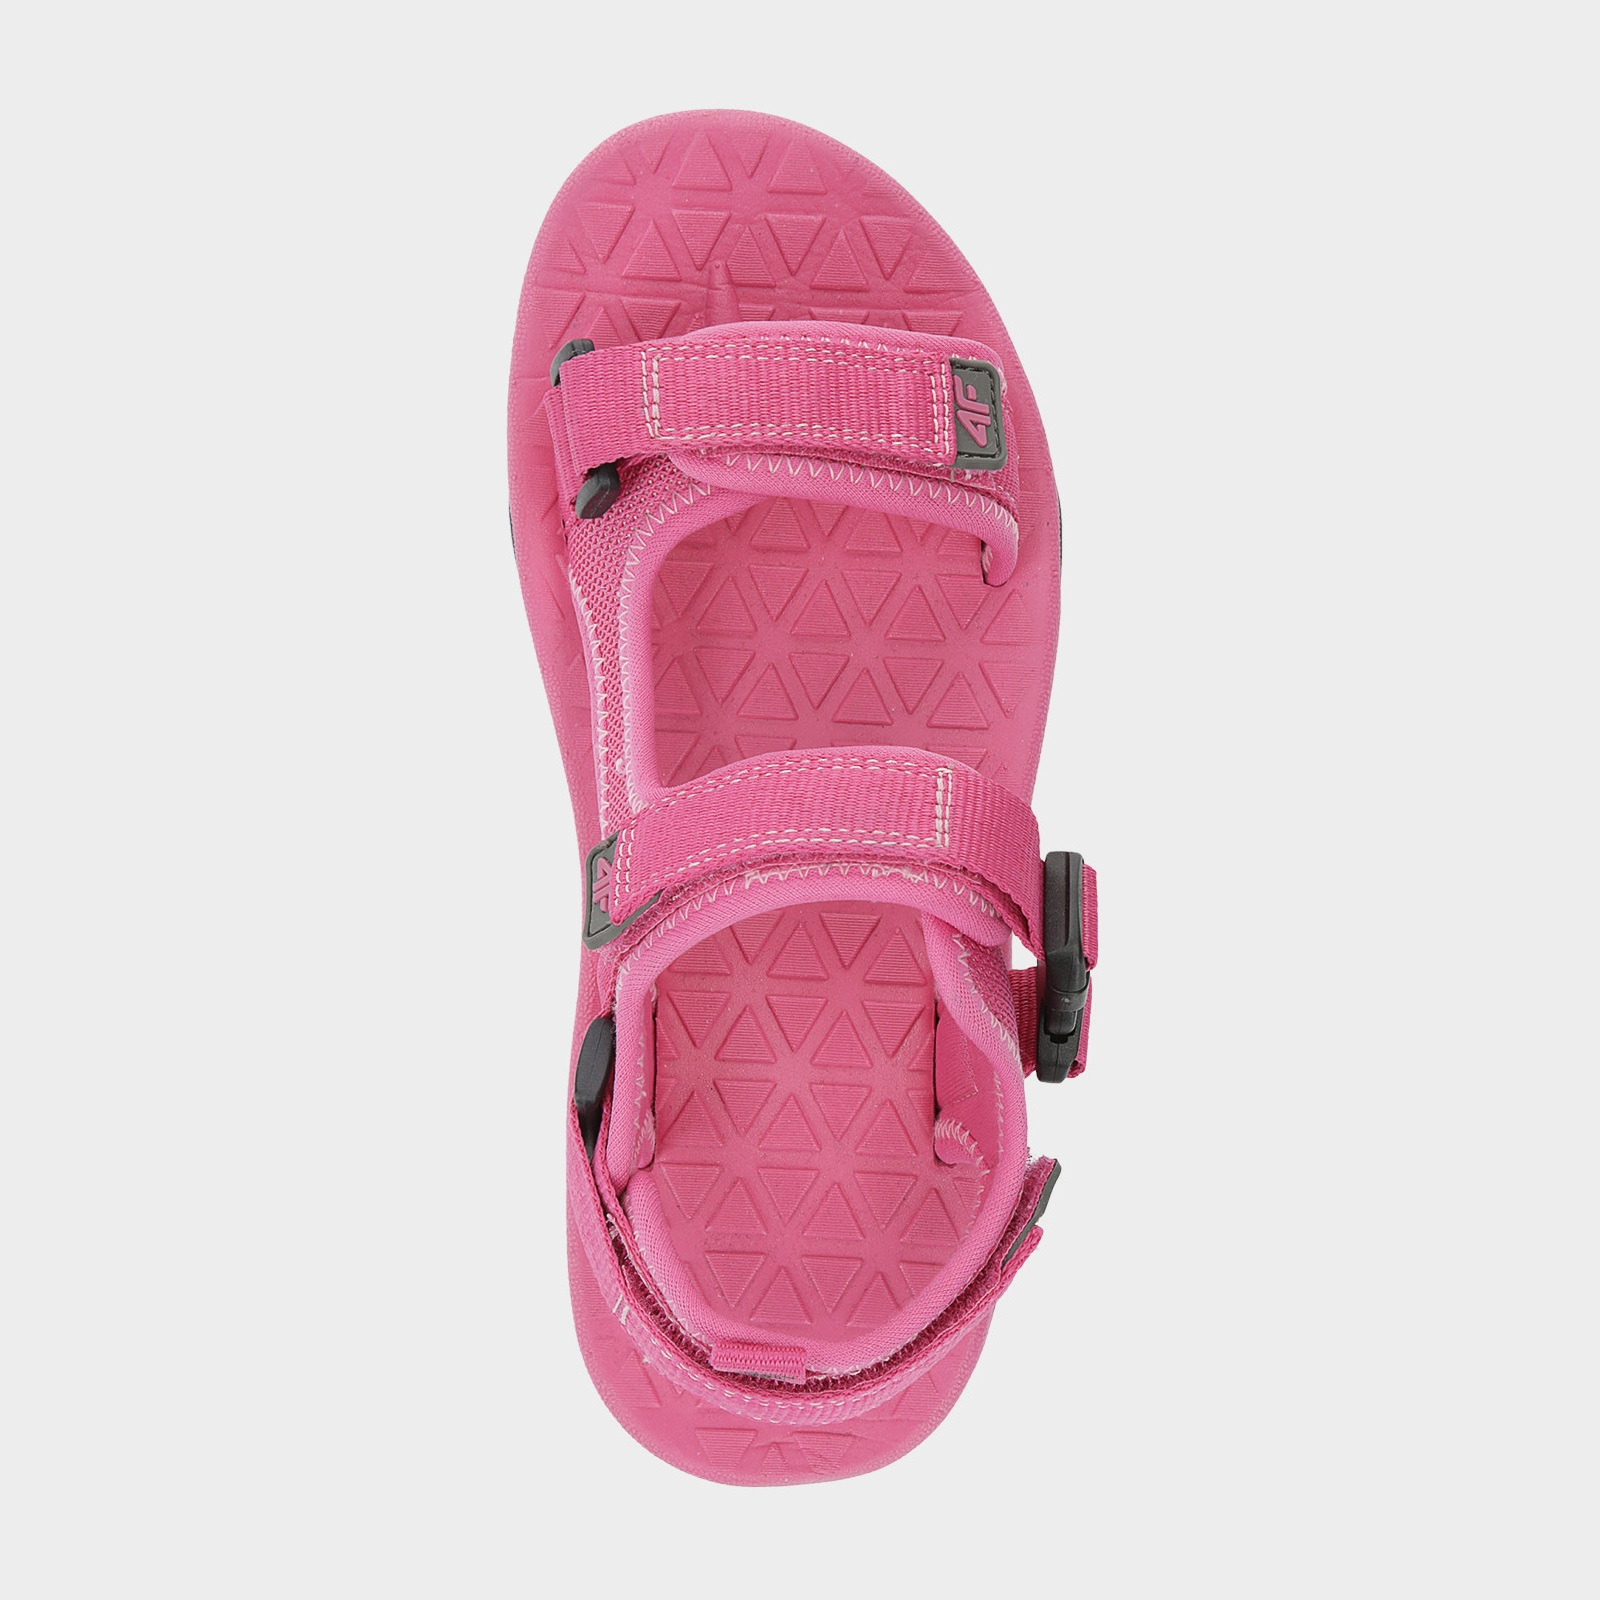 Shoes -  4f Girl Sandals JSAD002